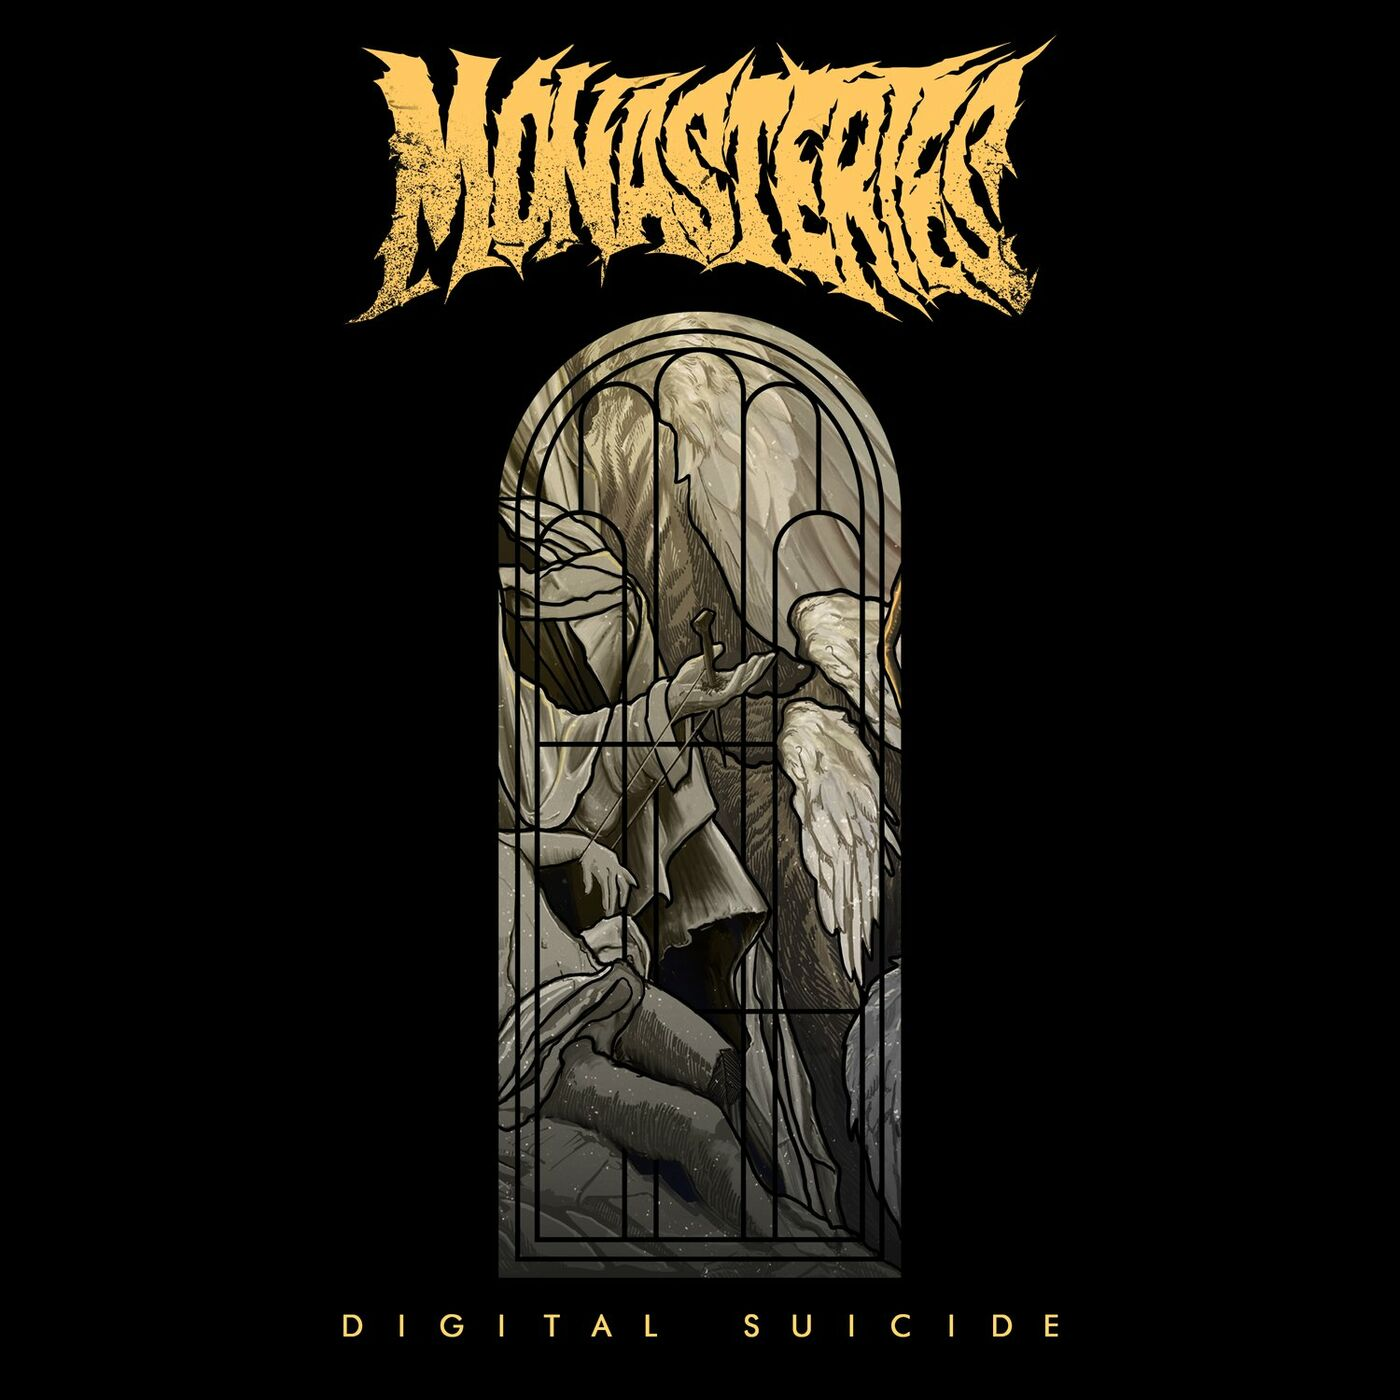 Monasteries - Digital Suicide [single] (2021)